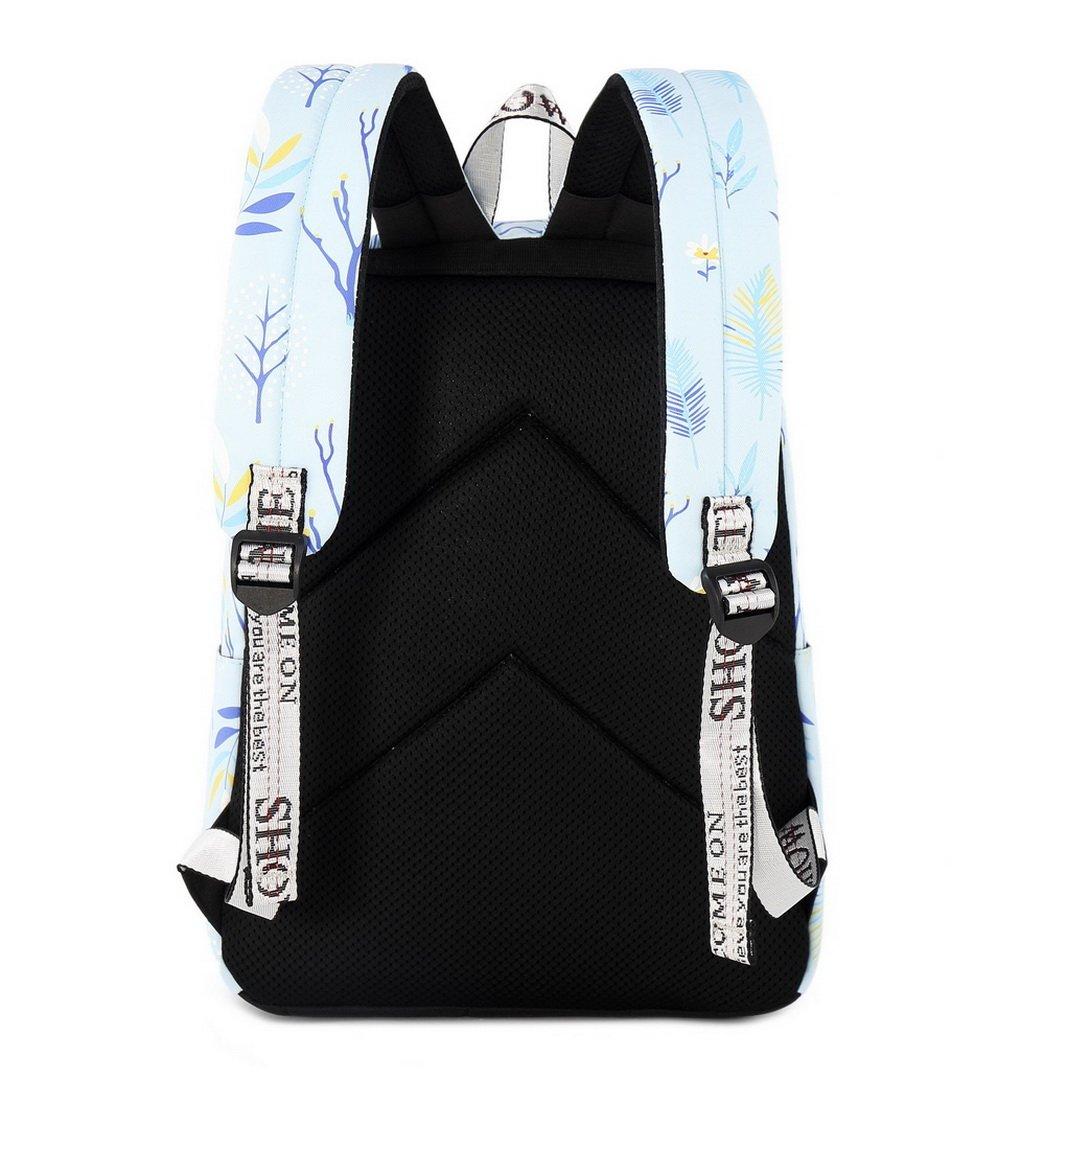 Amazon.com: Joymoze Waterproof Girl School Backpack Fit for 15.6